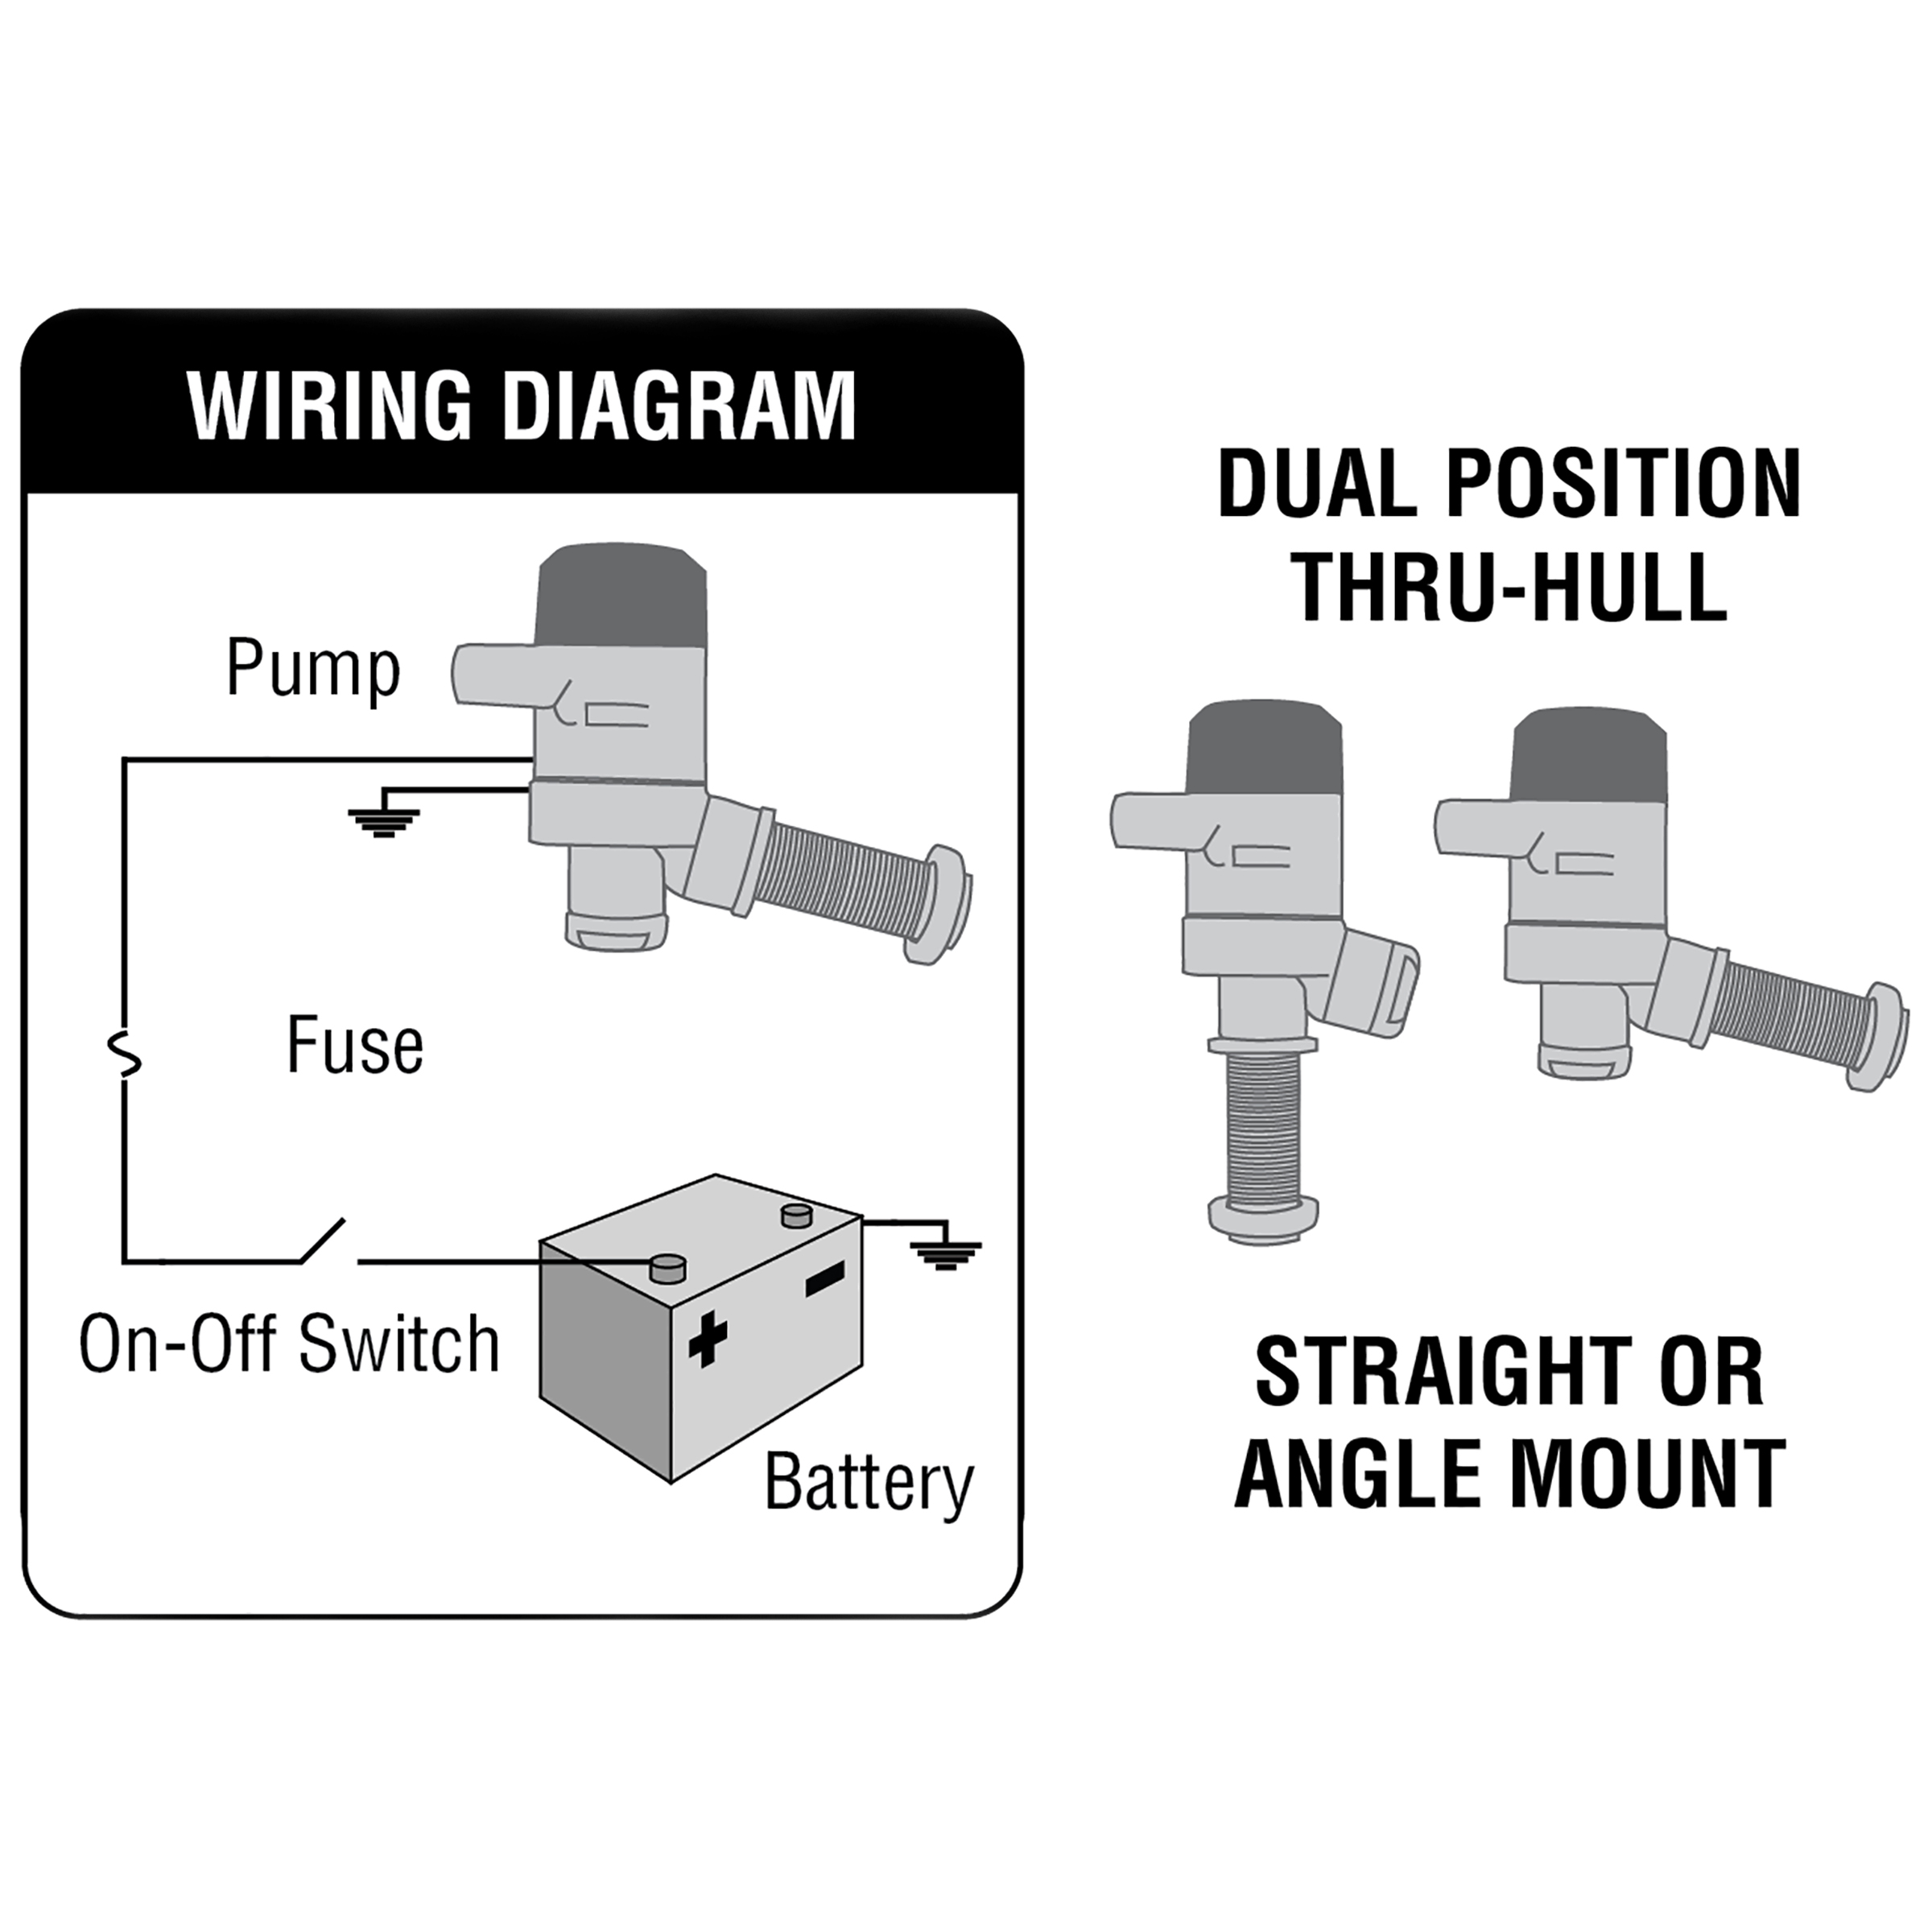 Shoreline Marine Bilge Pump Float Switch Wiring Diagram from i5.walmartimages.com